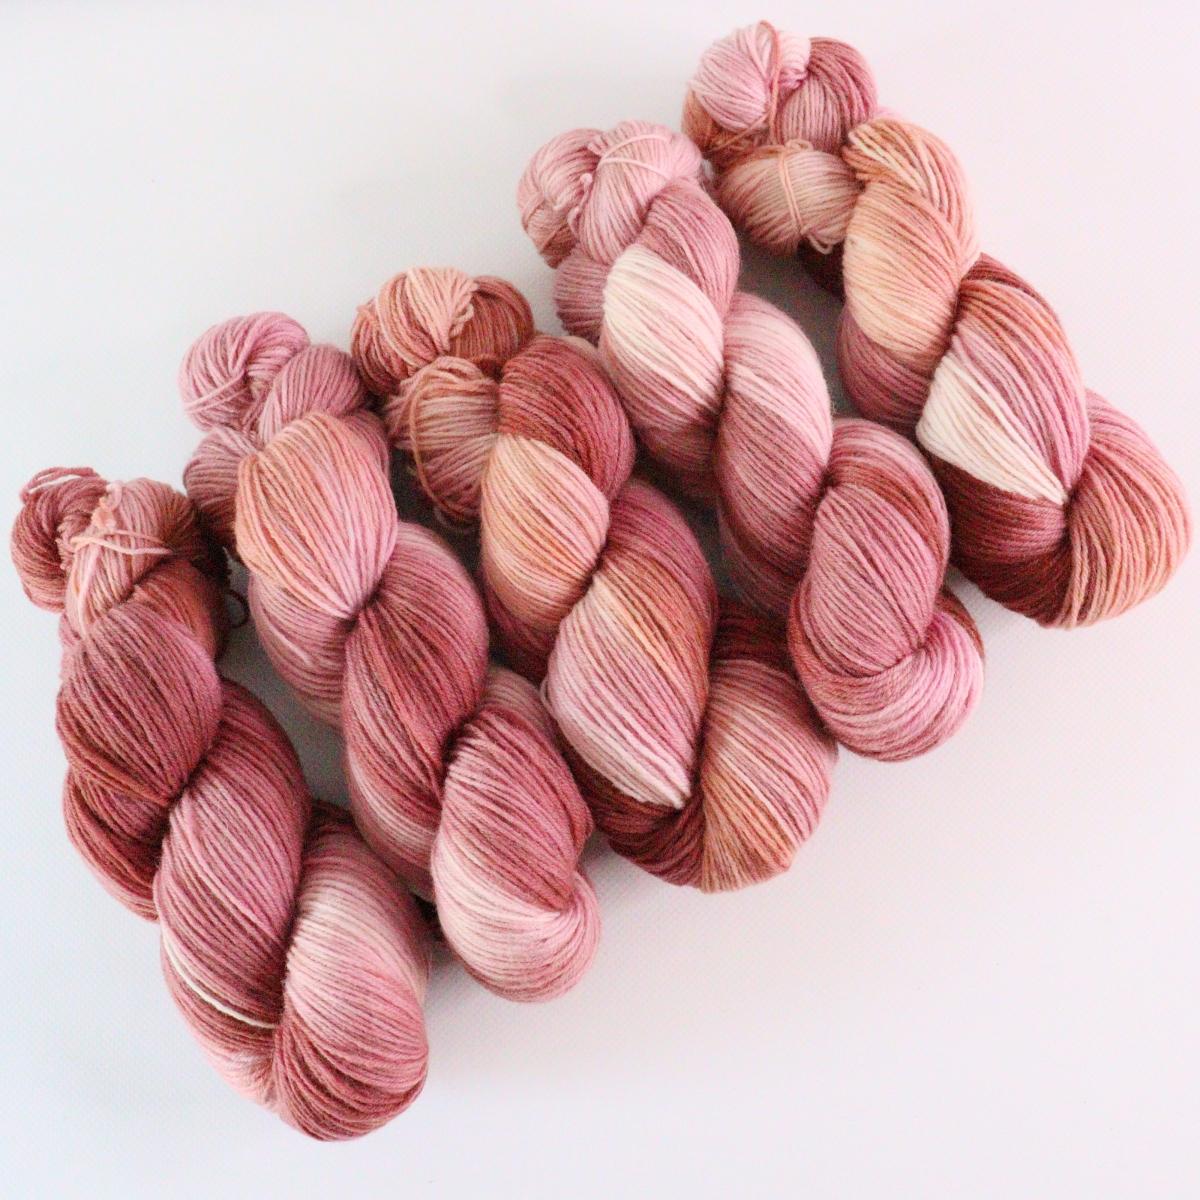 woodico.pro hand dyed yarn 075 2 1200x1200 - Hand dyed yarn / 075